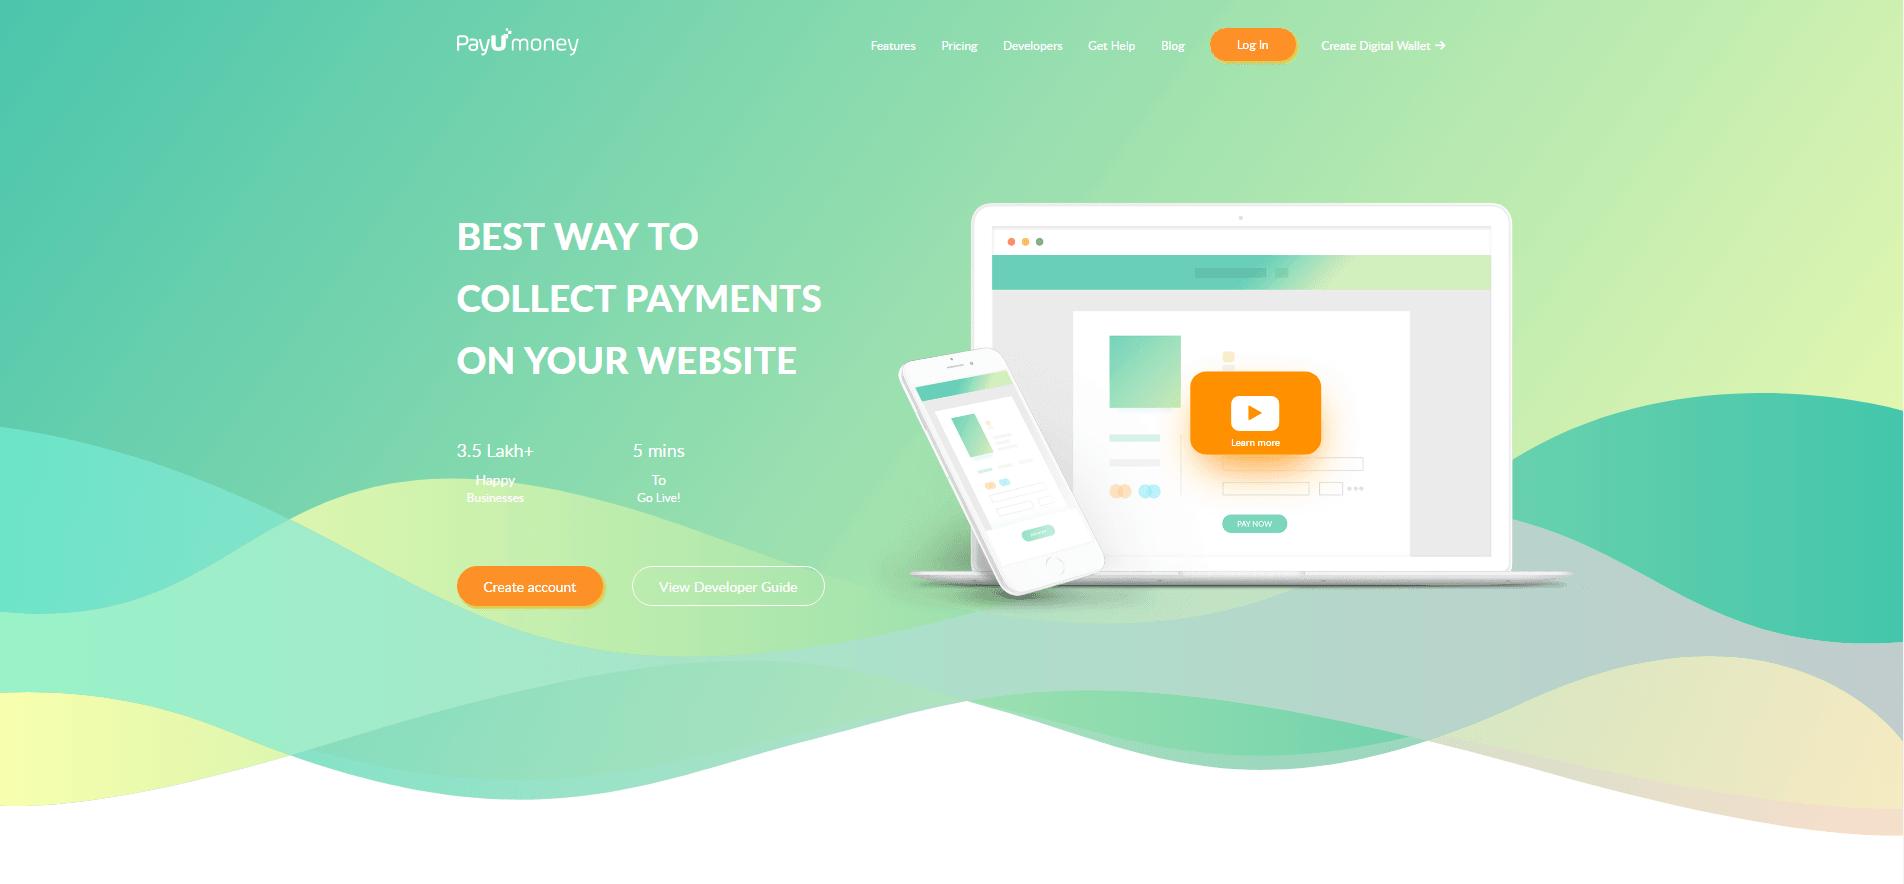 PayUmoney-UI